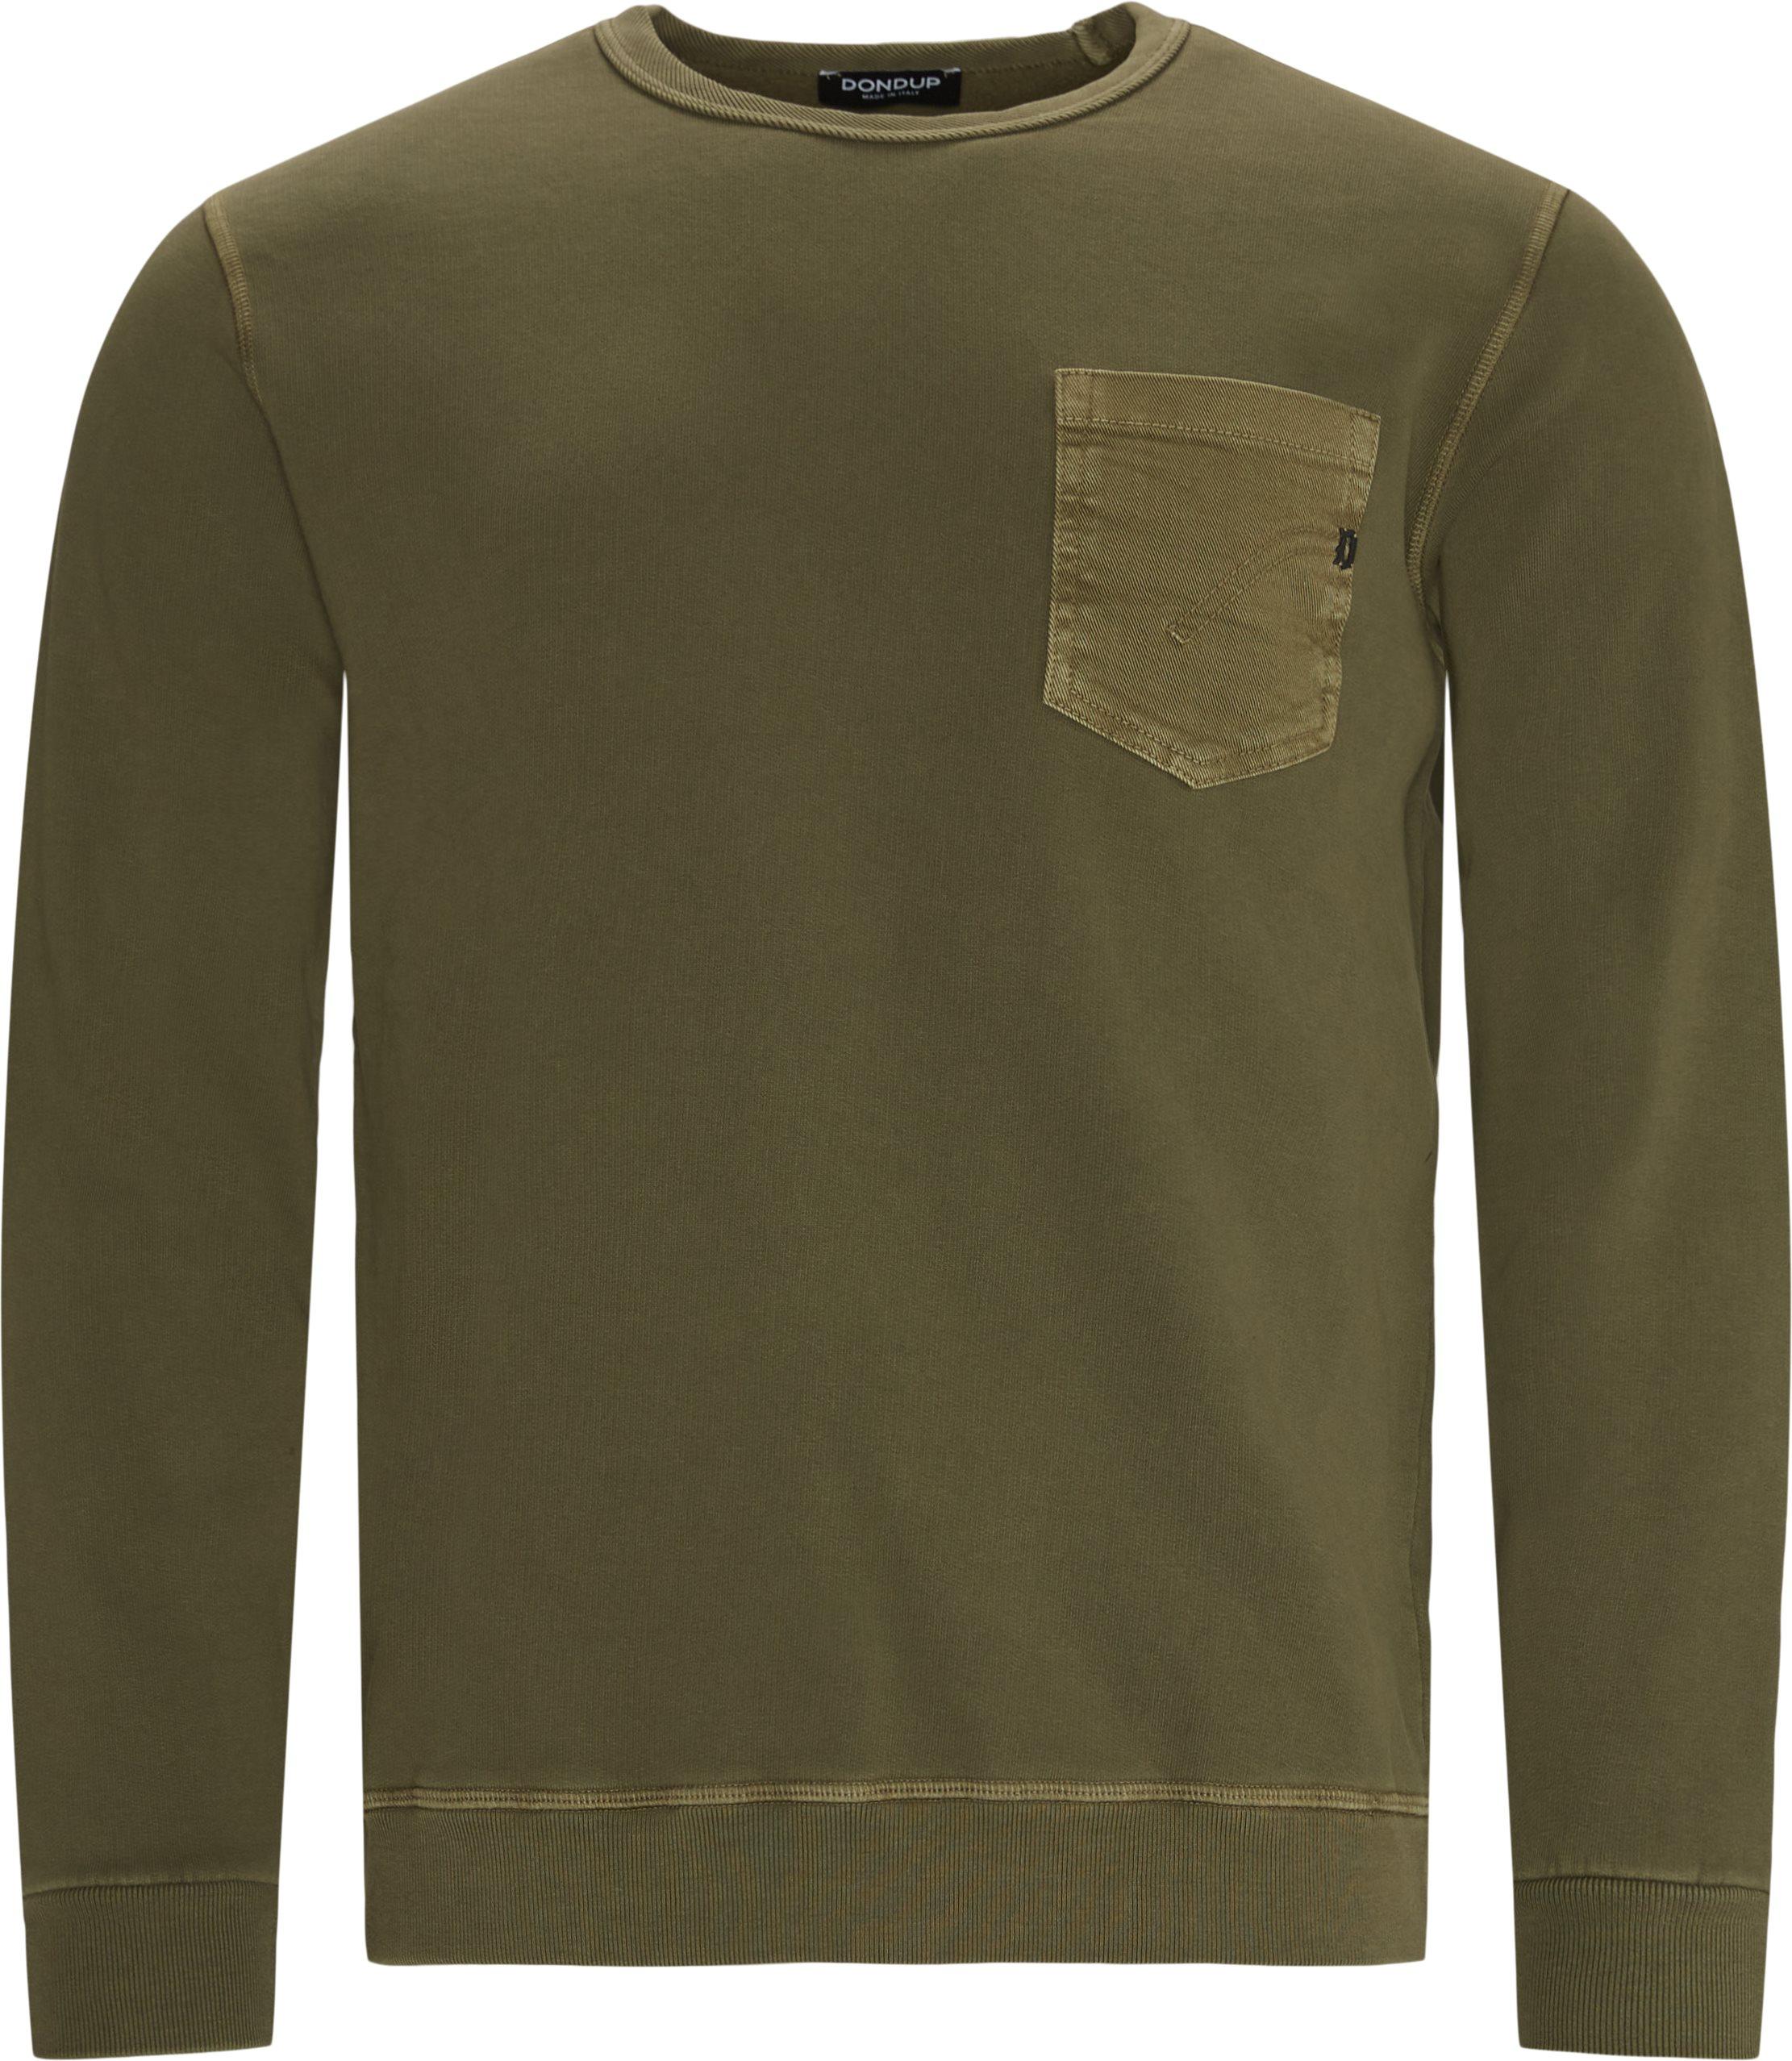 Pocket Crewneck - Sweatshirts - Regular fit - Army